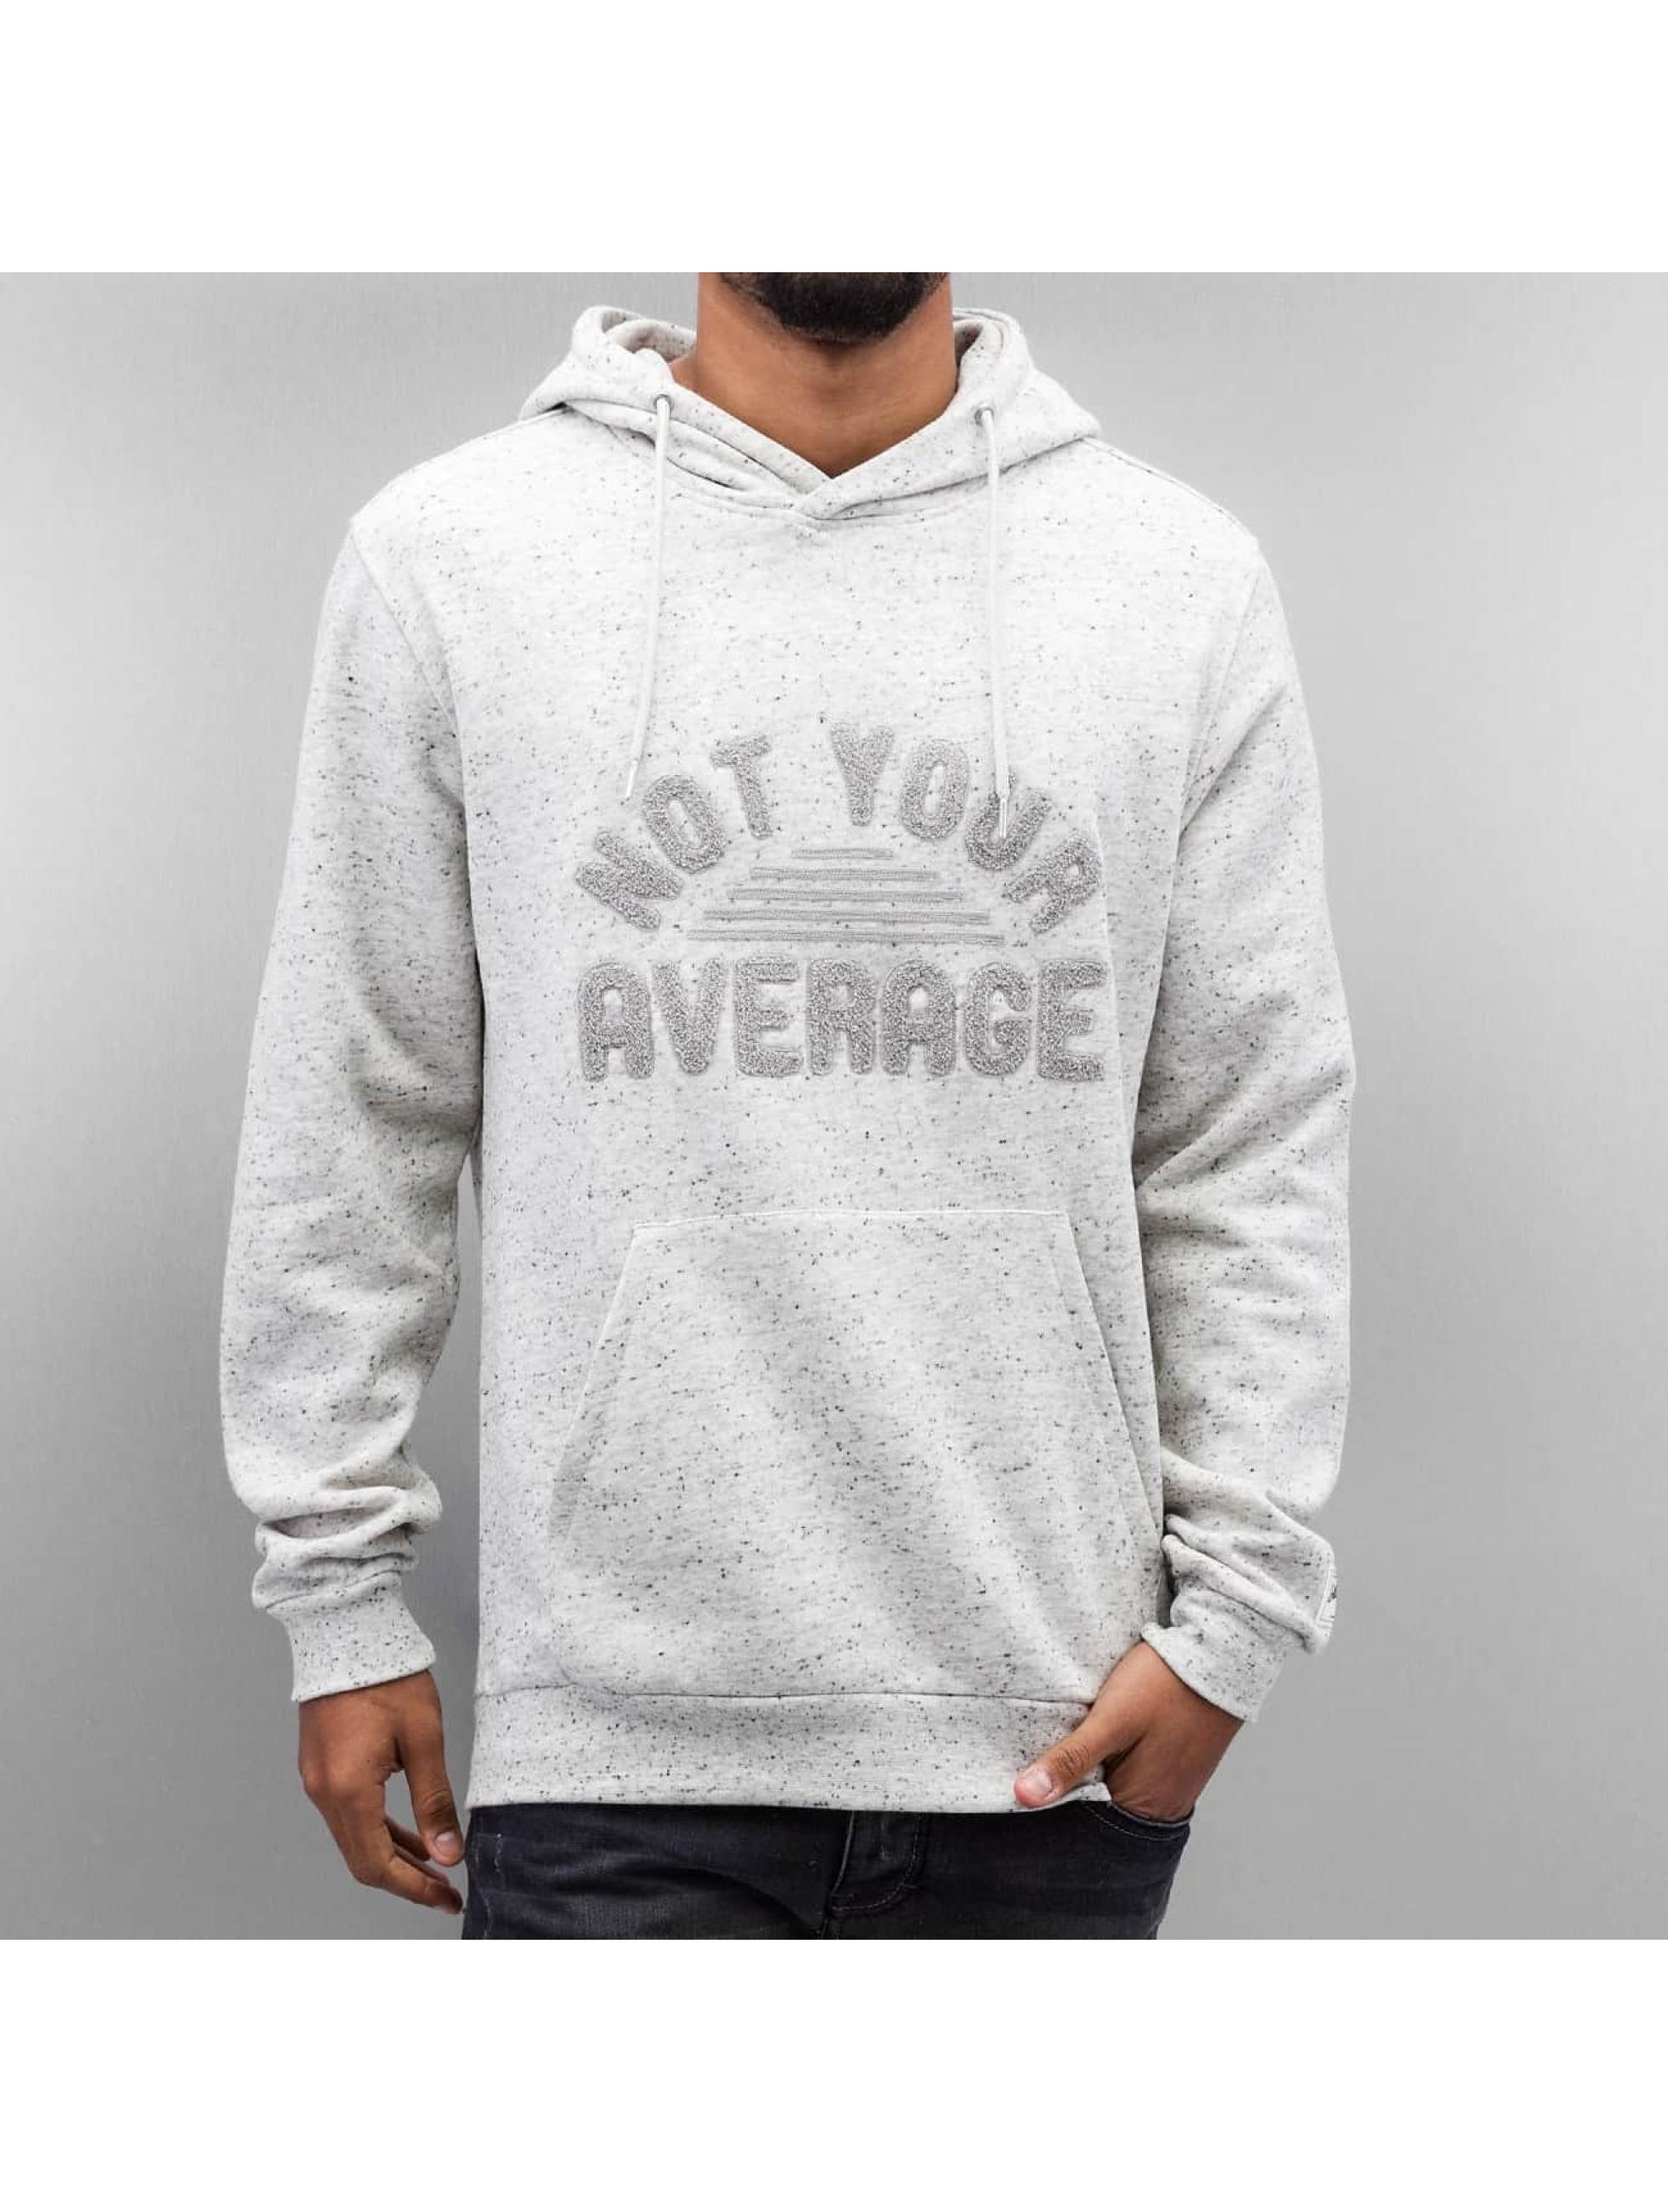 Pelle Pelle Pullover Not Your Average grau